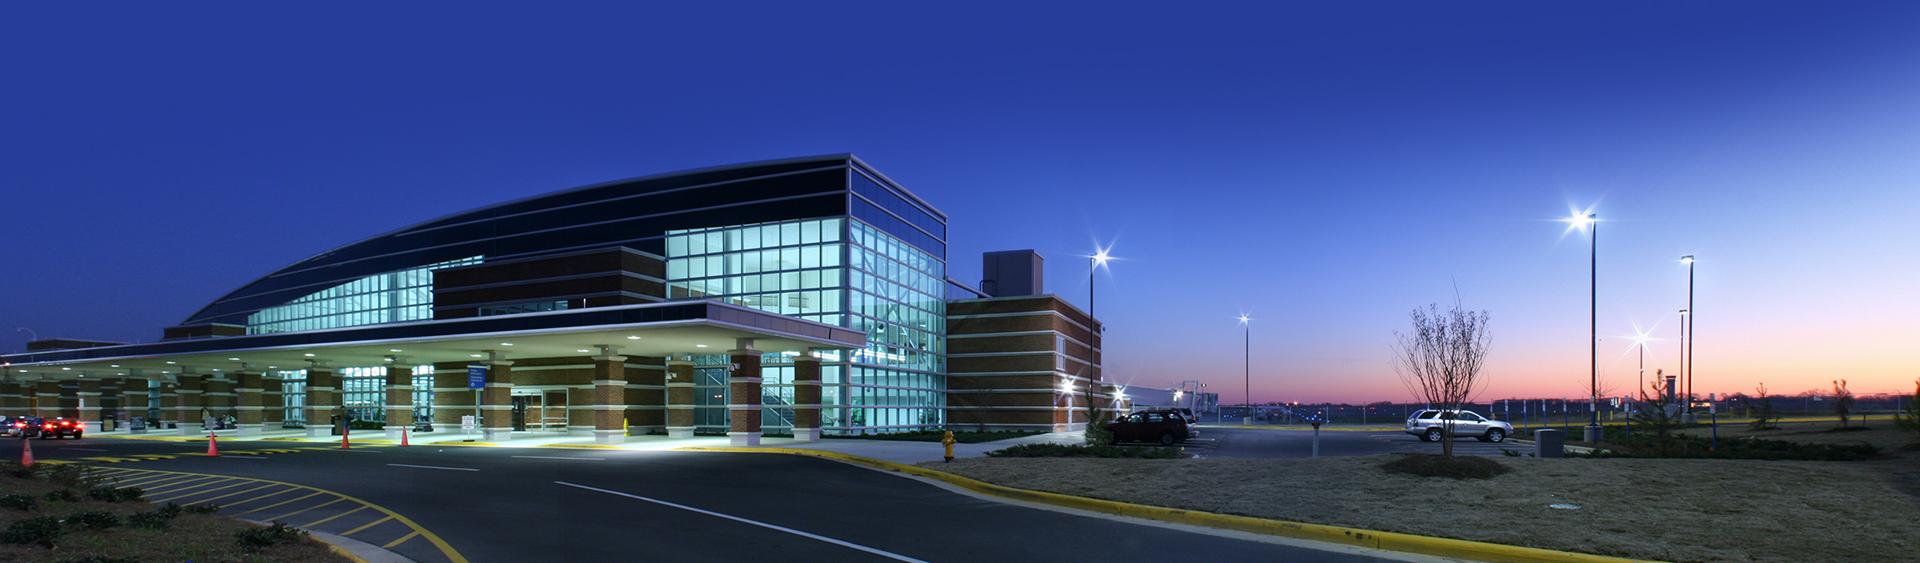 Montgomery Regional Airport, FlyMGM, Montgomery Alabama, Montgomery Area Chamber of Commerce, Montgomery Chamber, MGMChamber